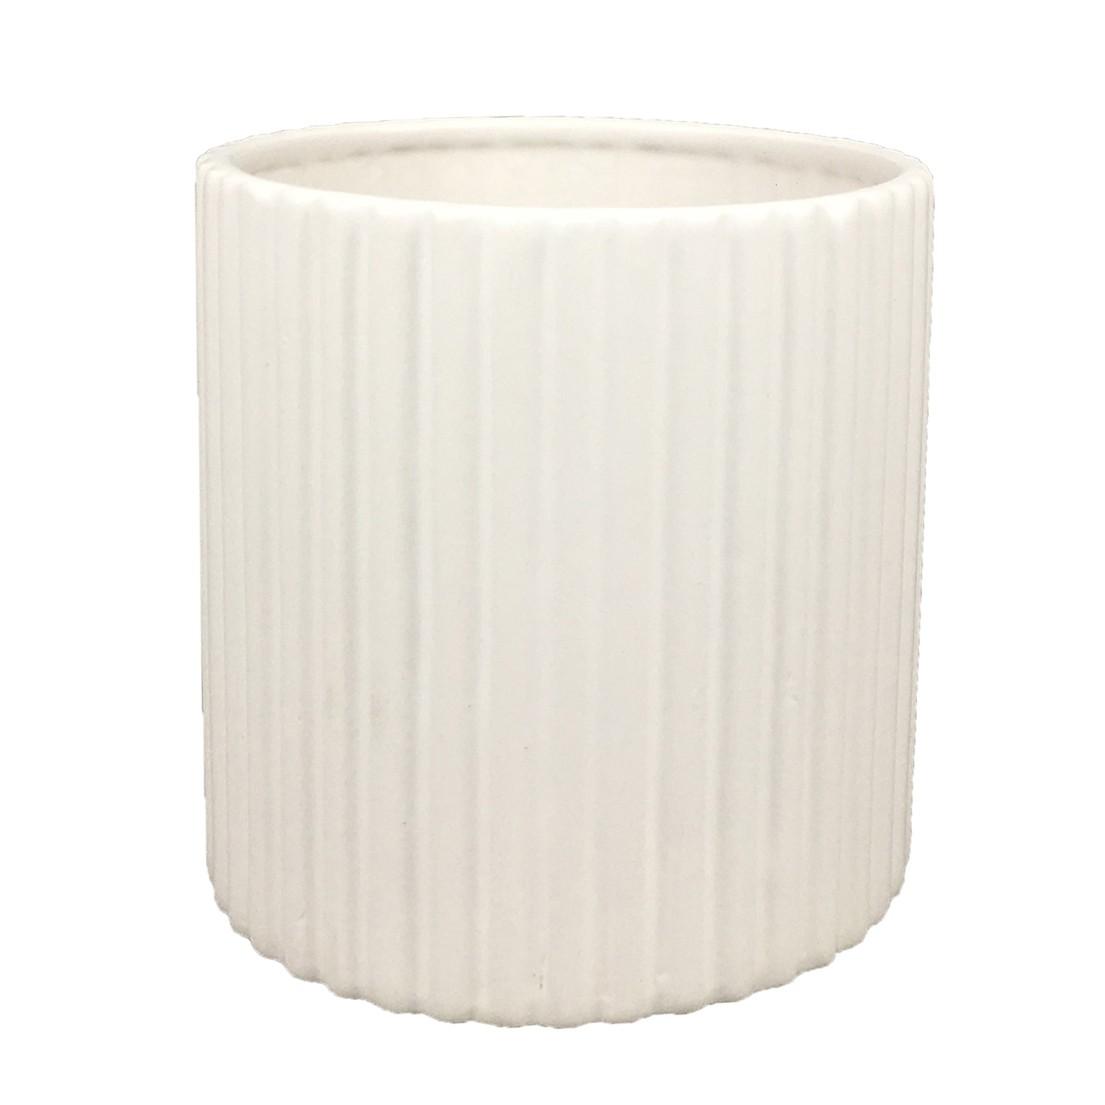 Vaso Cachepô de Cerâmica Listrado Branco